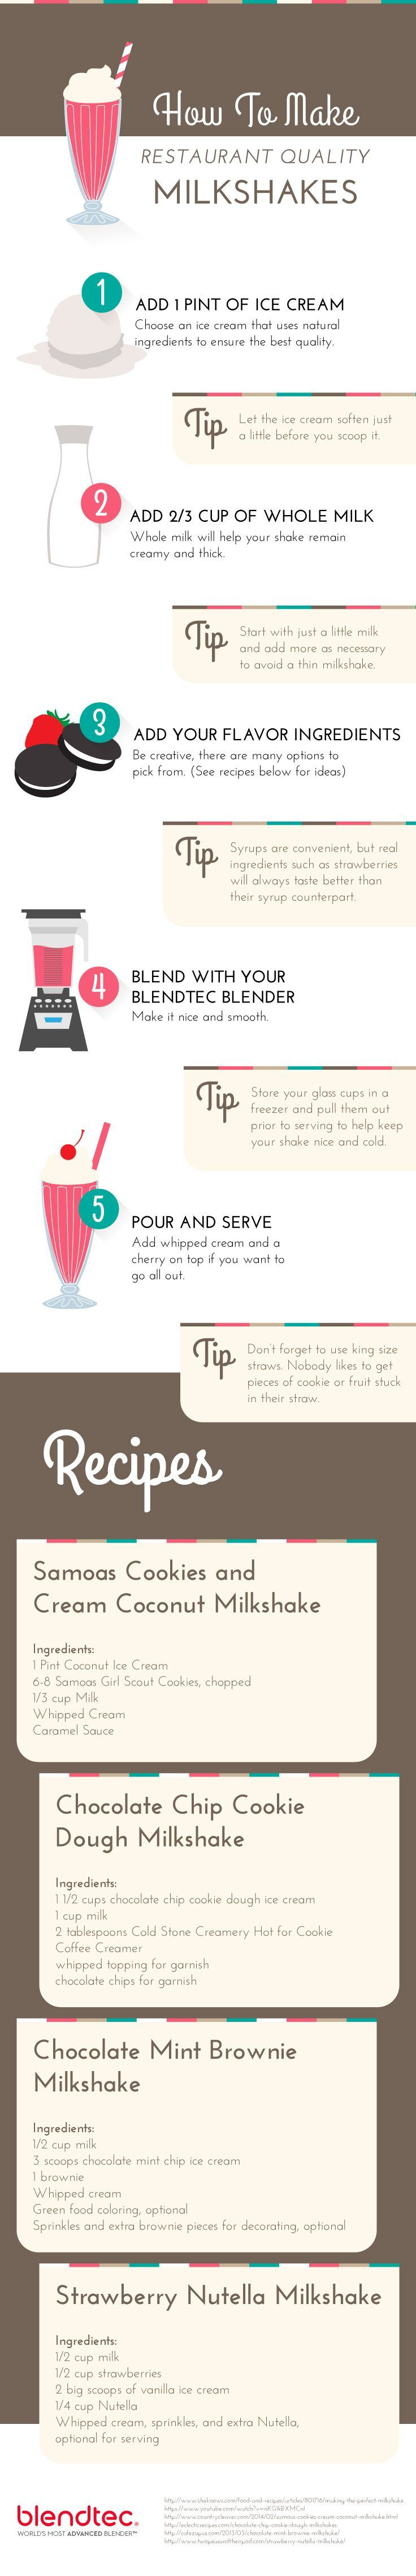 4 Thick Milkshake Recipes | Blendtec Blog